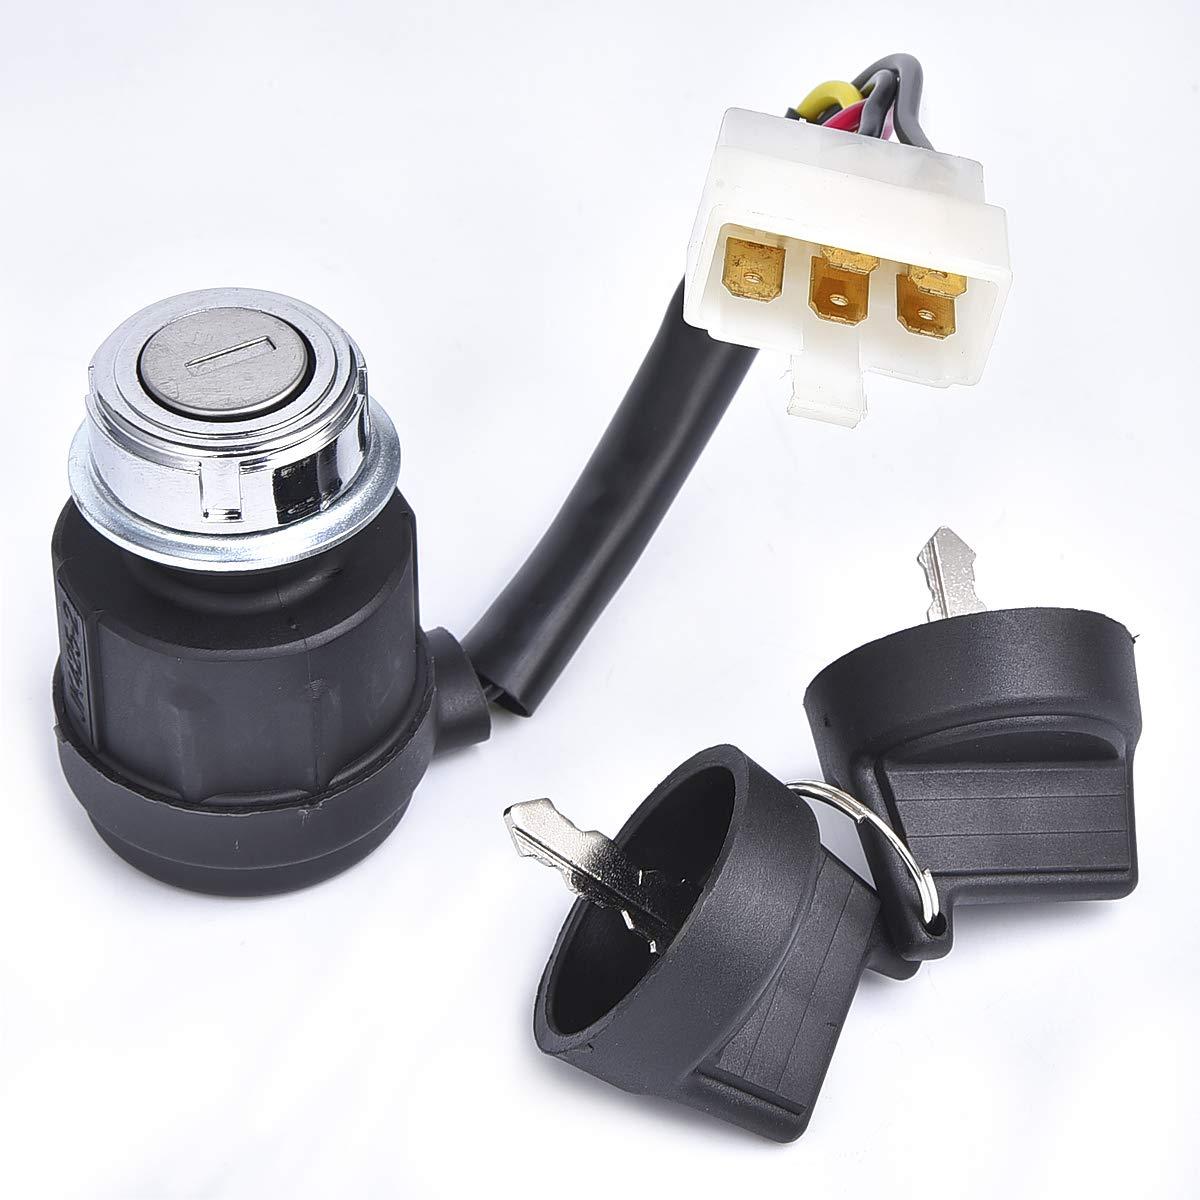 5 Wire Ignition Key Switch Dual Keys for Diesel Generator ATV Halley